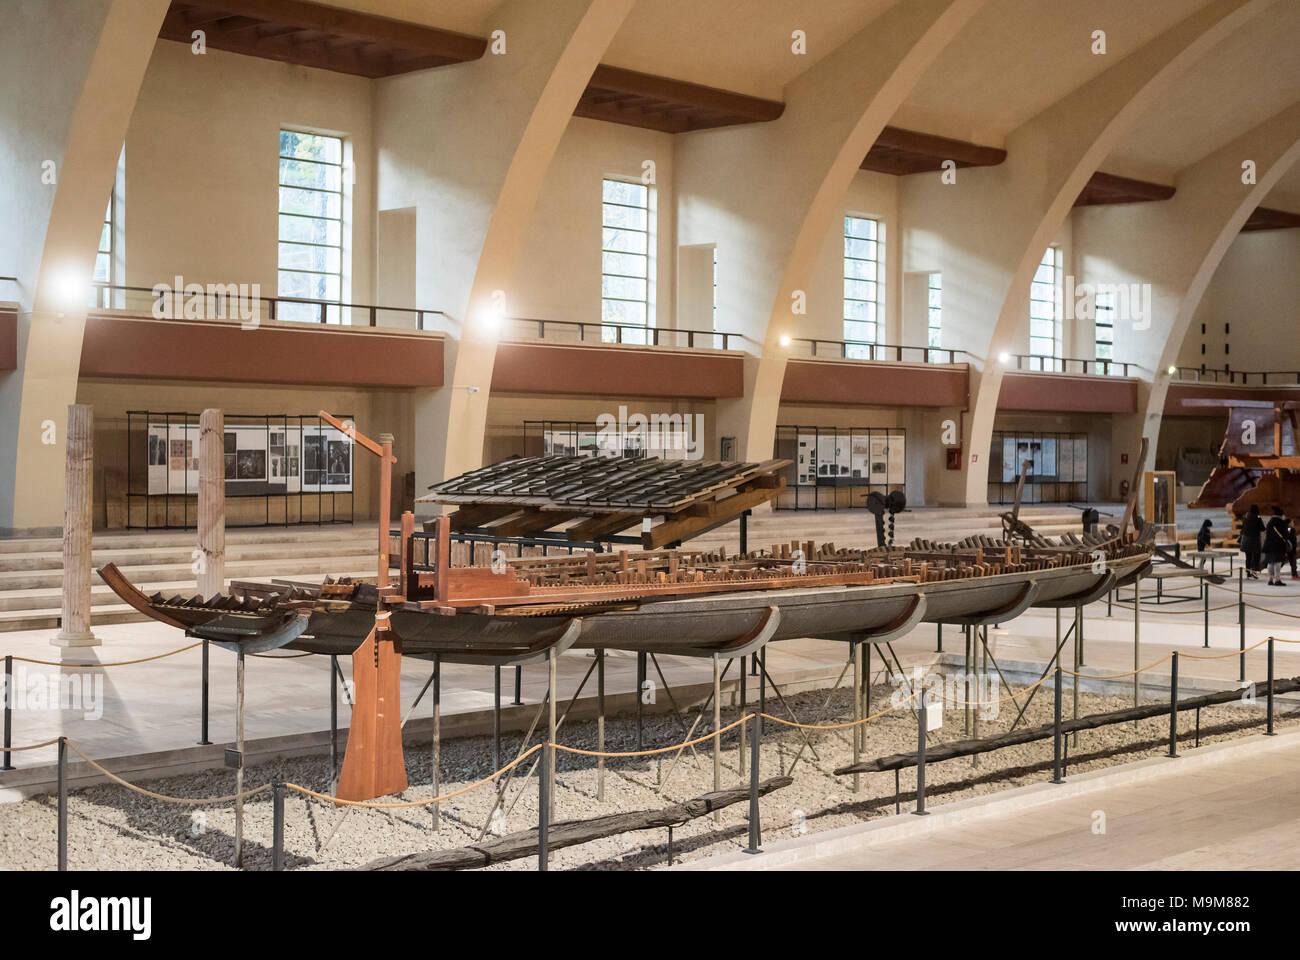 Nemi. Lazio. Italy. Museo delle navi romane di Nemi, (Museum of Ancient Roman Ships), displaying models of the remains of Roman Emperor Caligula's - Stock Image